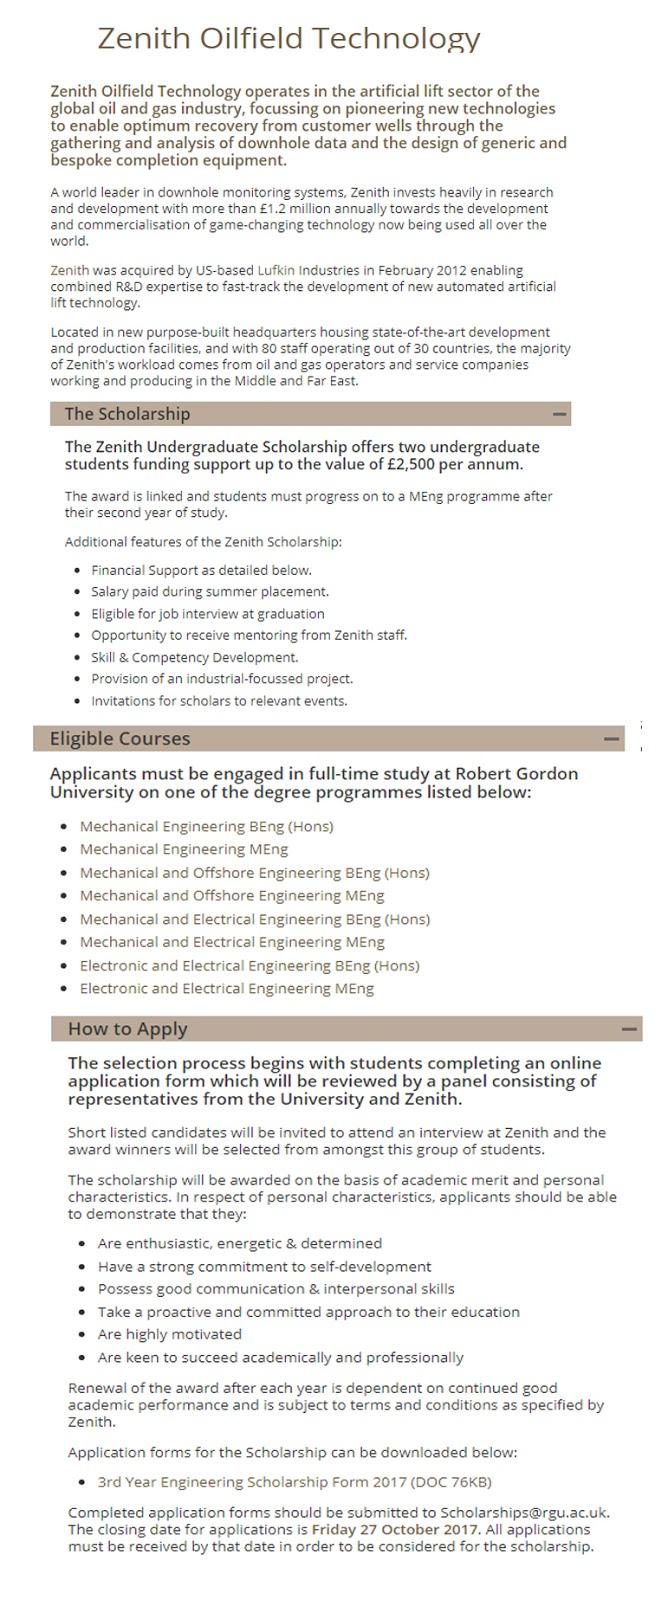 Zenith International Undergraduate Scholarships at Robert Gordon University in UK